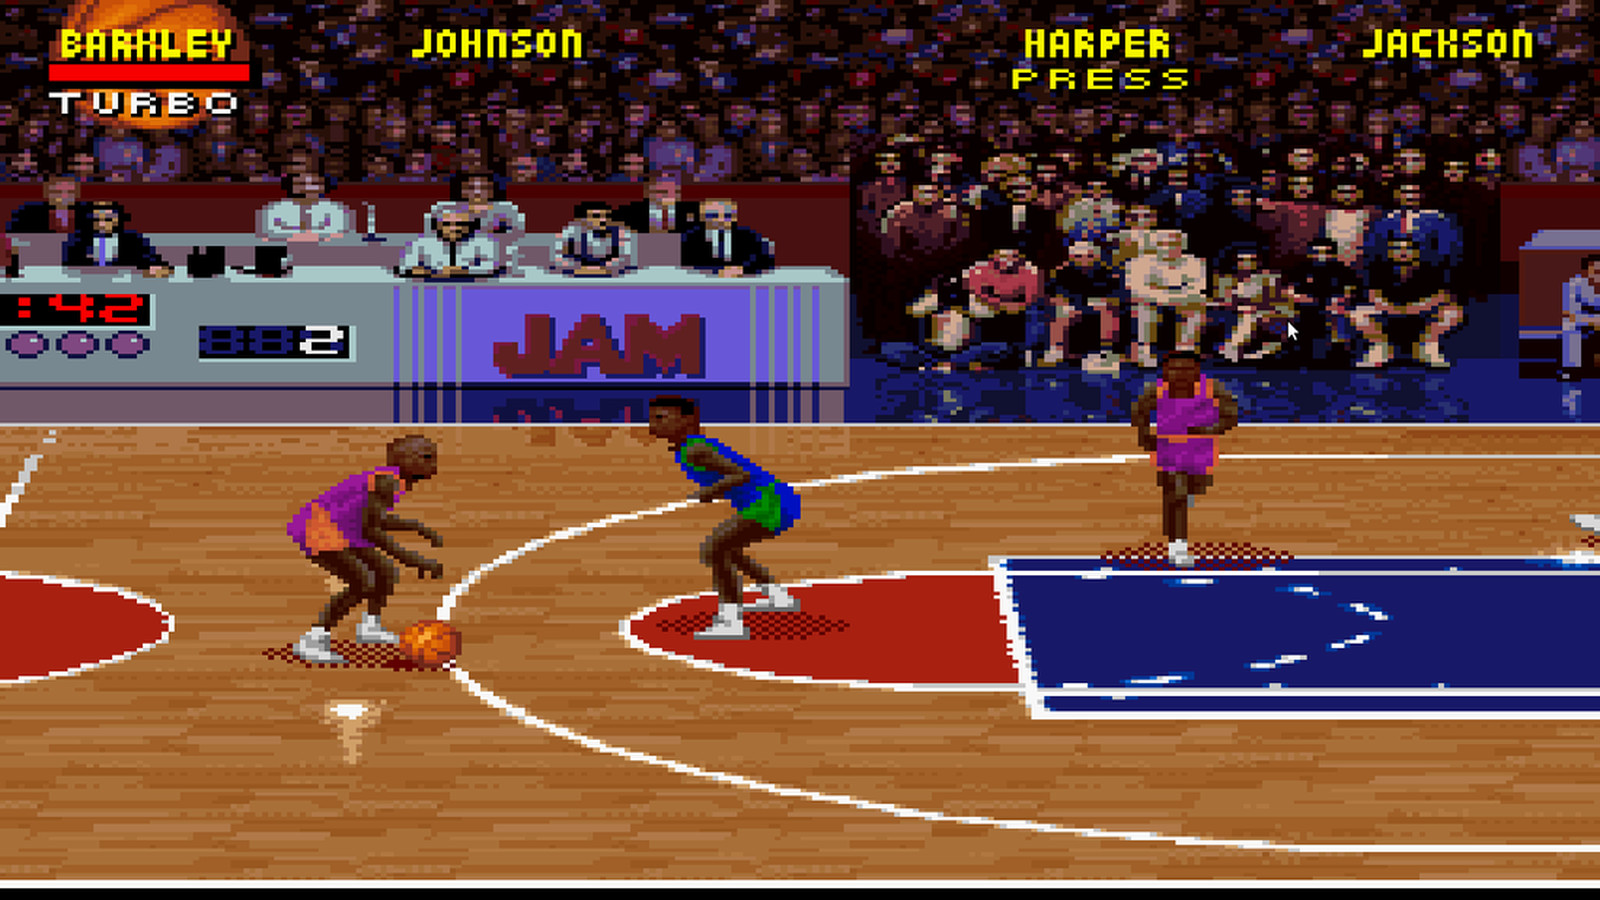 Nba Jam S Mythical Michael Jordan Version May Yet Survive